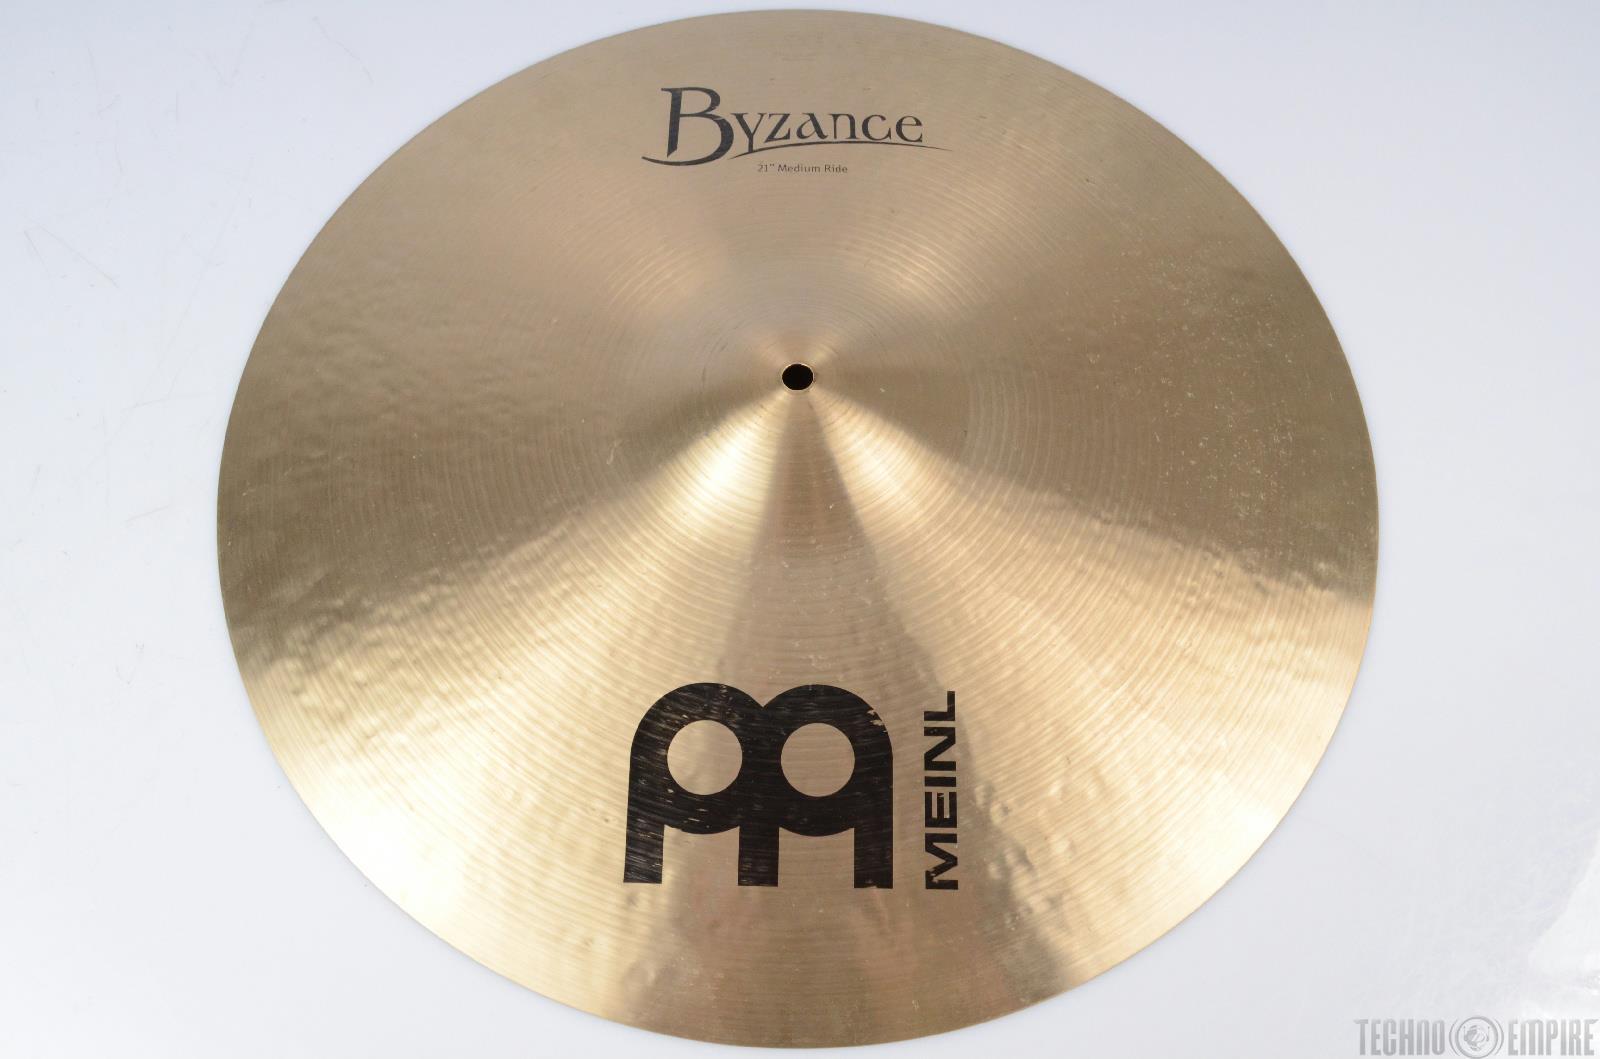 "MEINL Byzance Traditional 21"" Medium Ride Cymbals #21355"